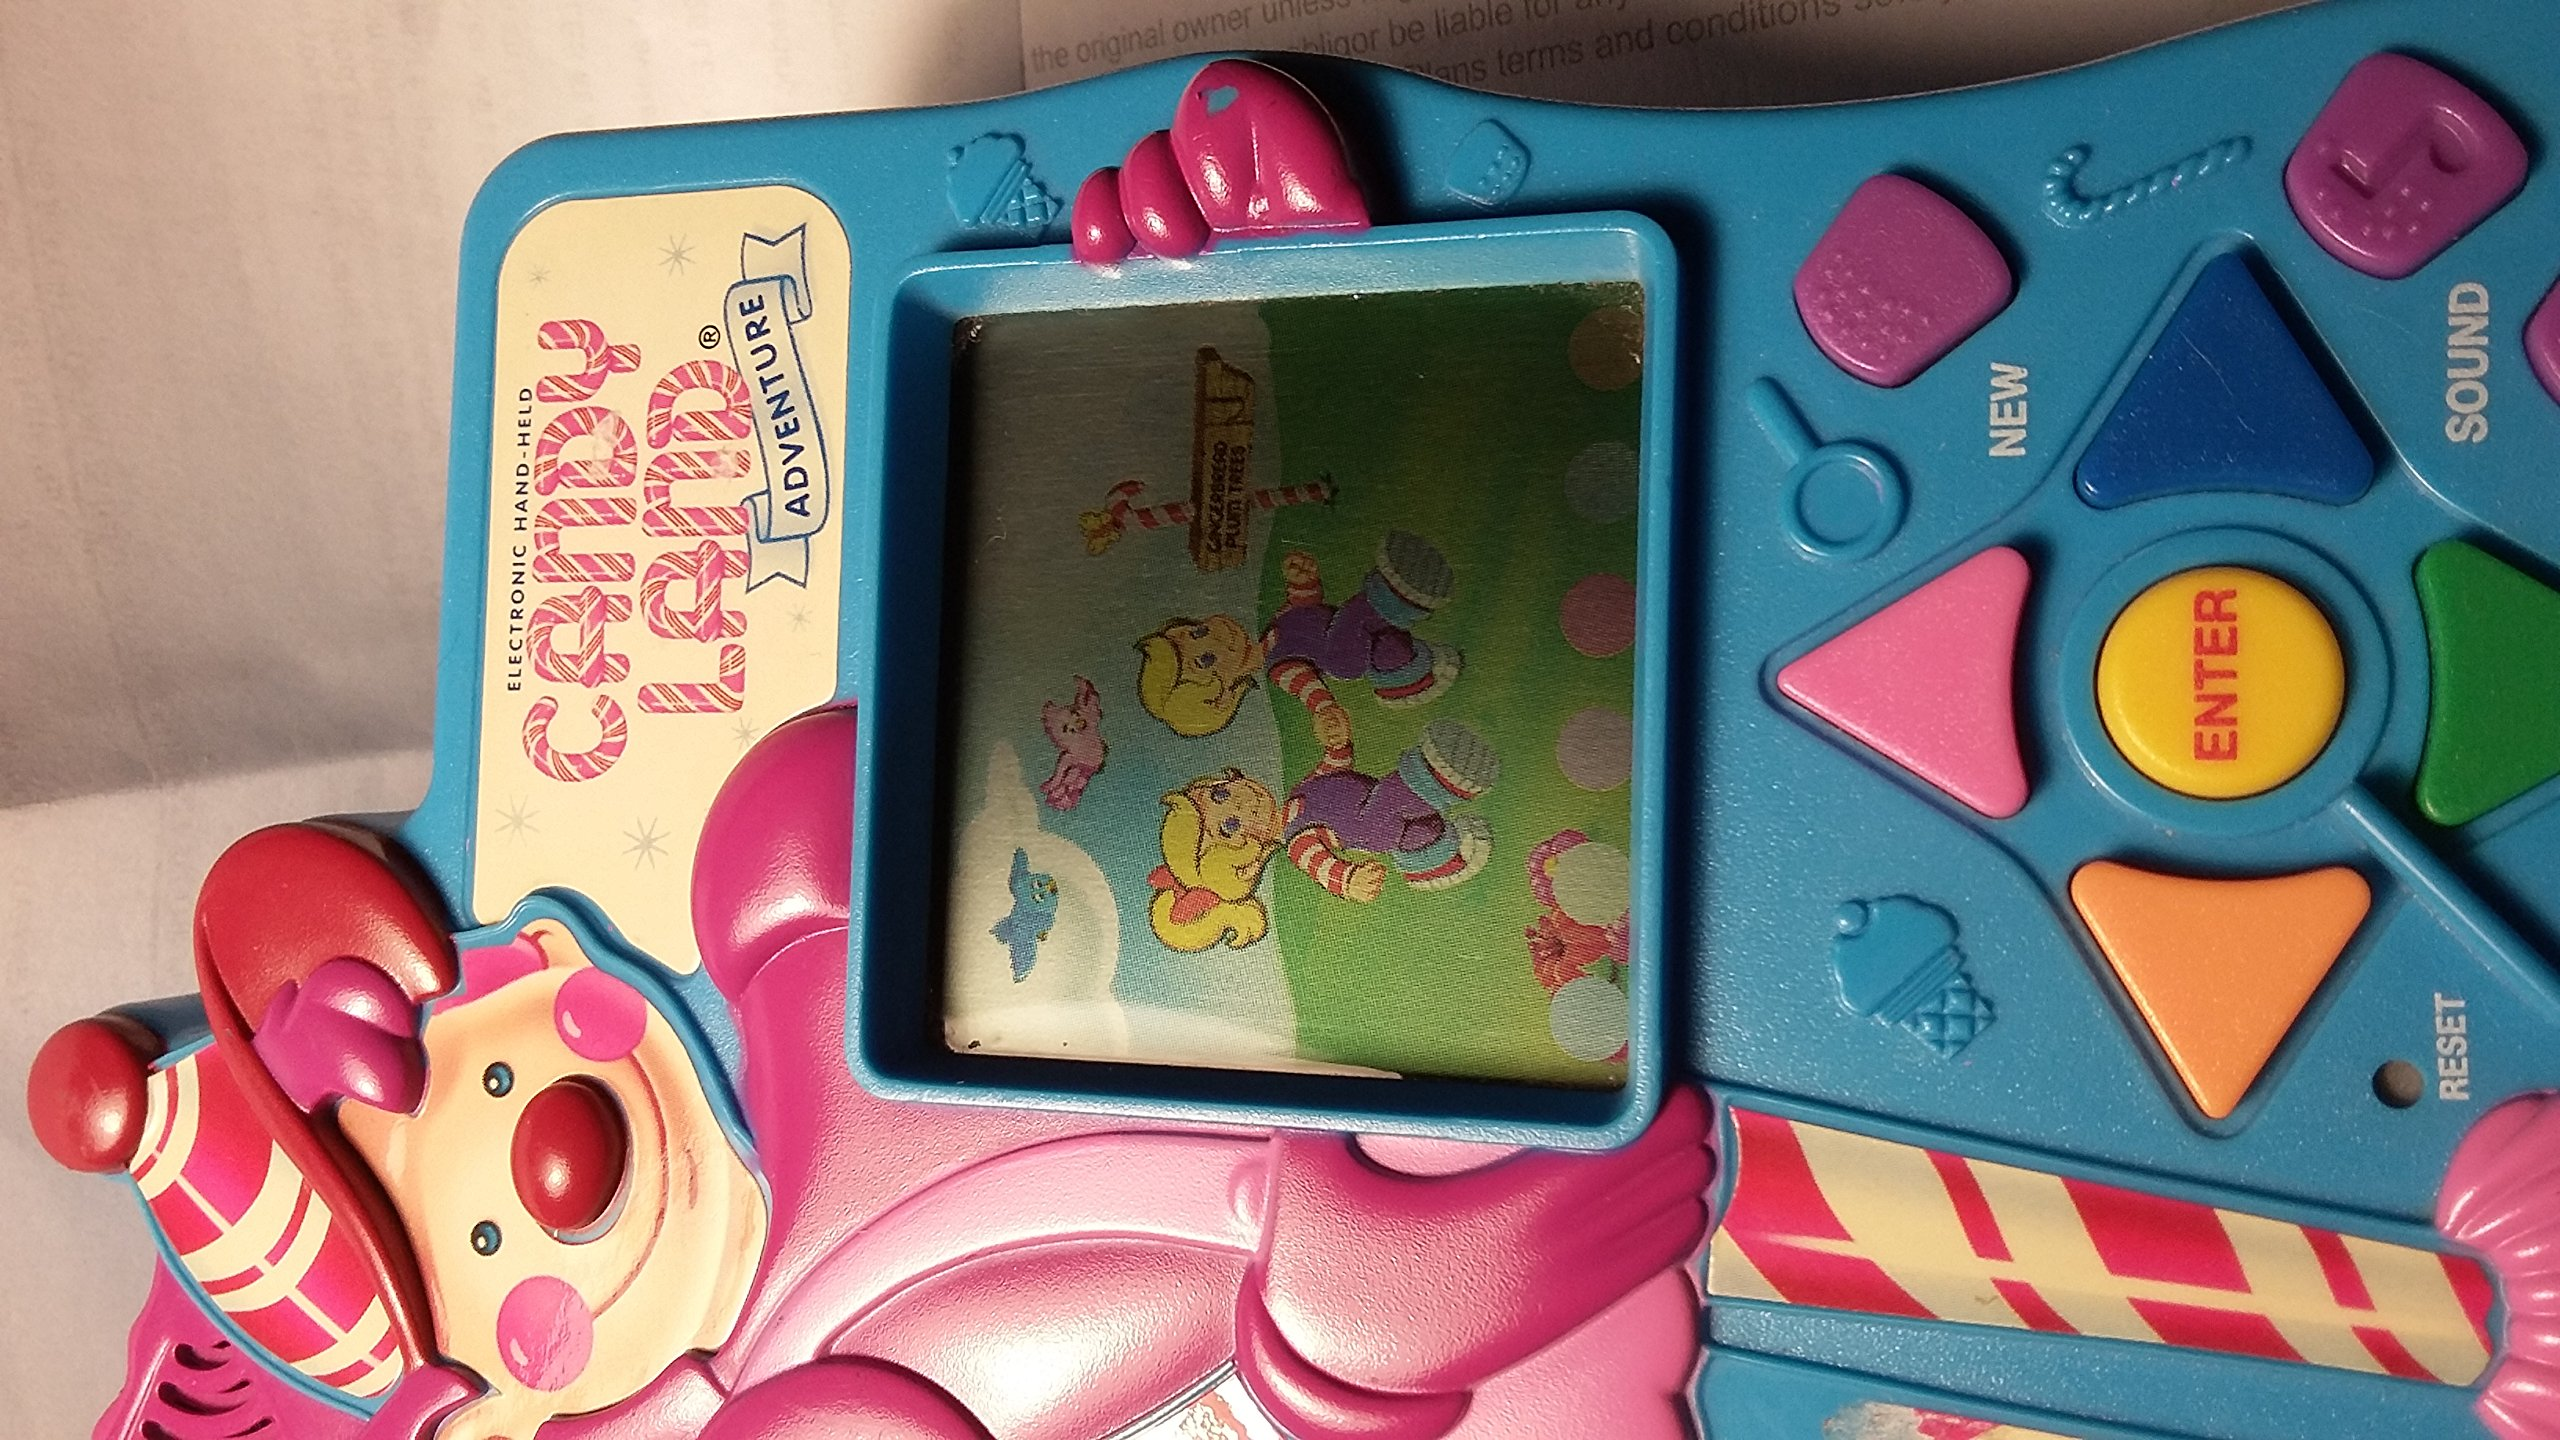 1997 Milton Bradley Company Milton Bradley Electronic Hand-Held Candy Land Adventure LCD Game #4820